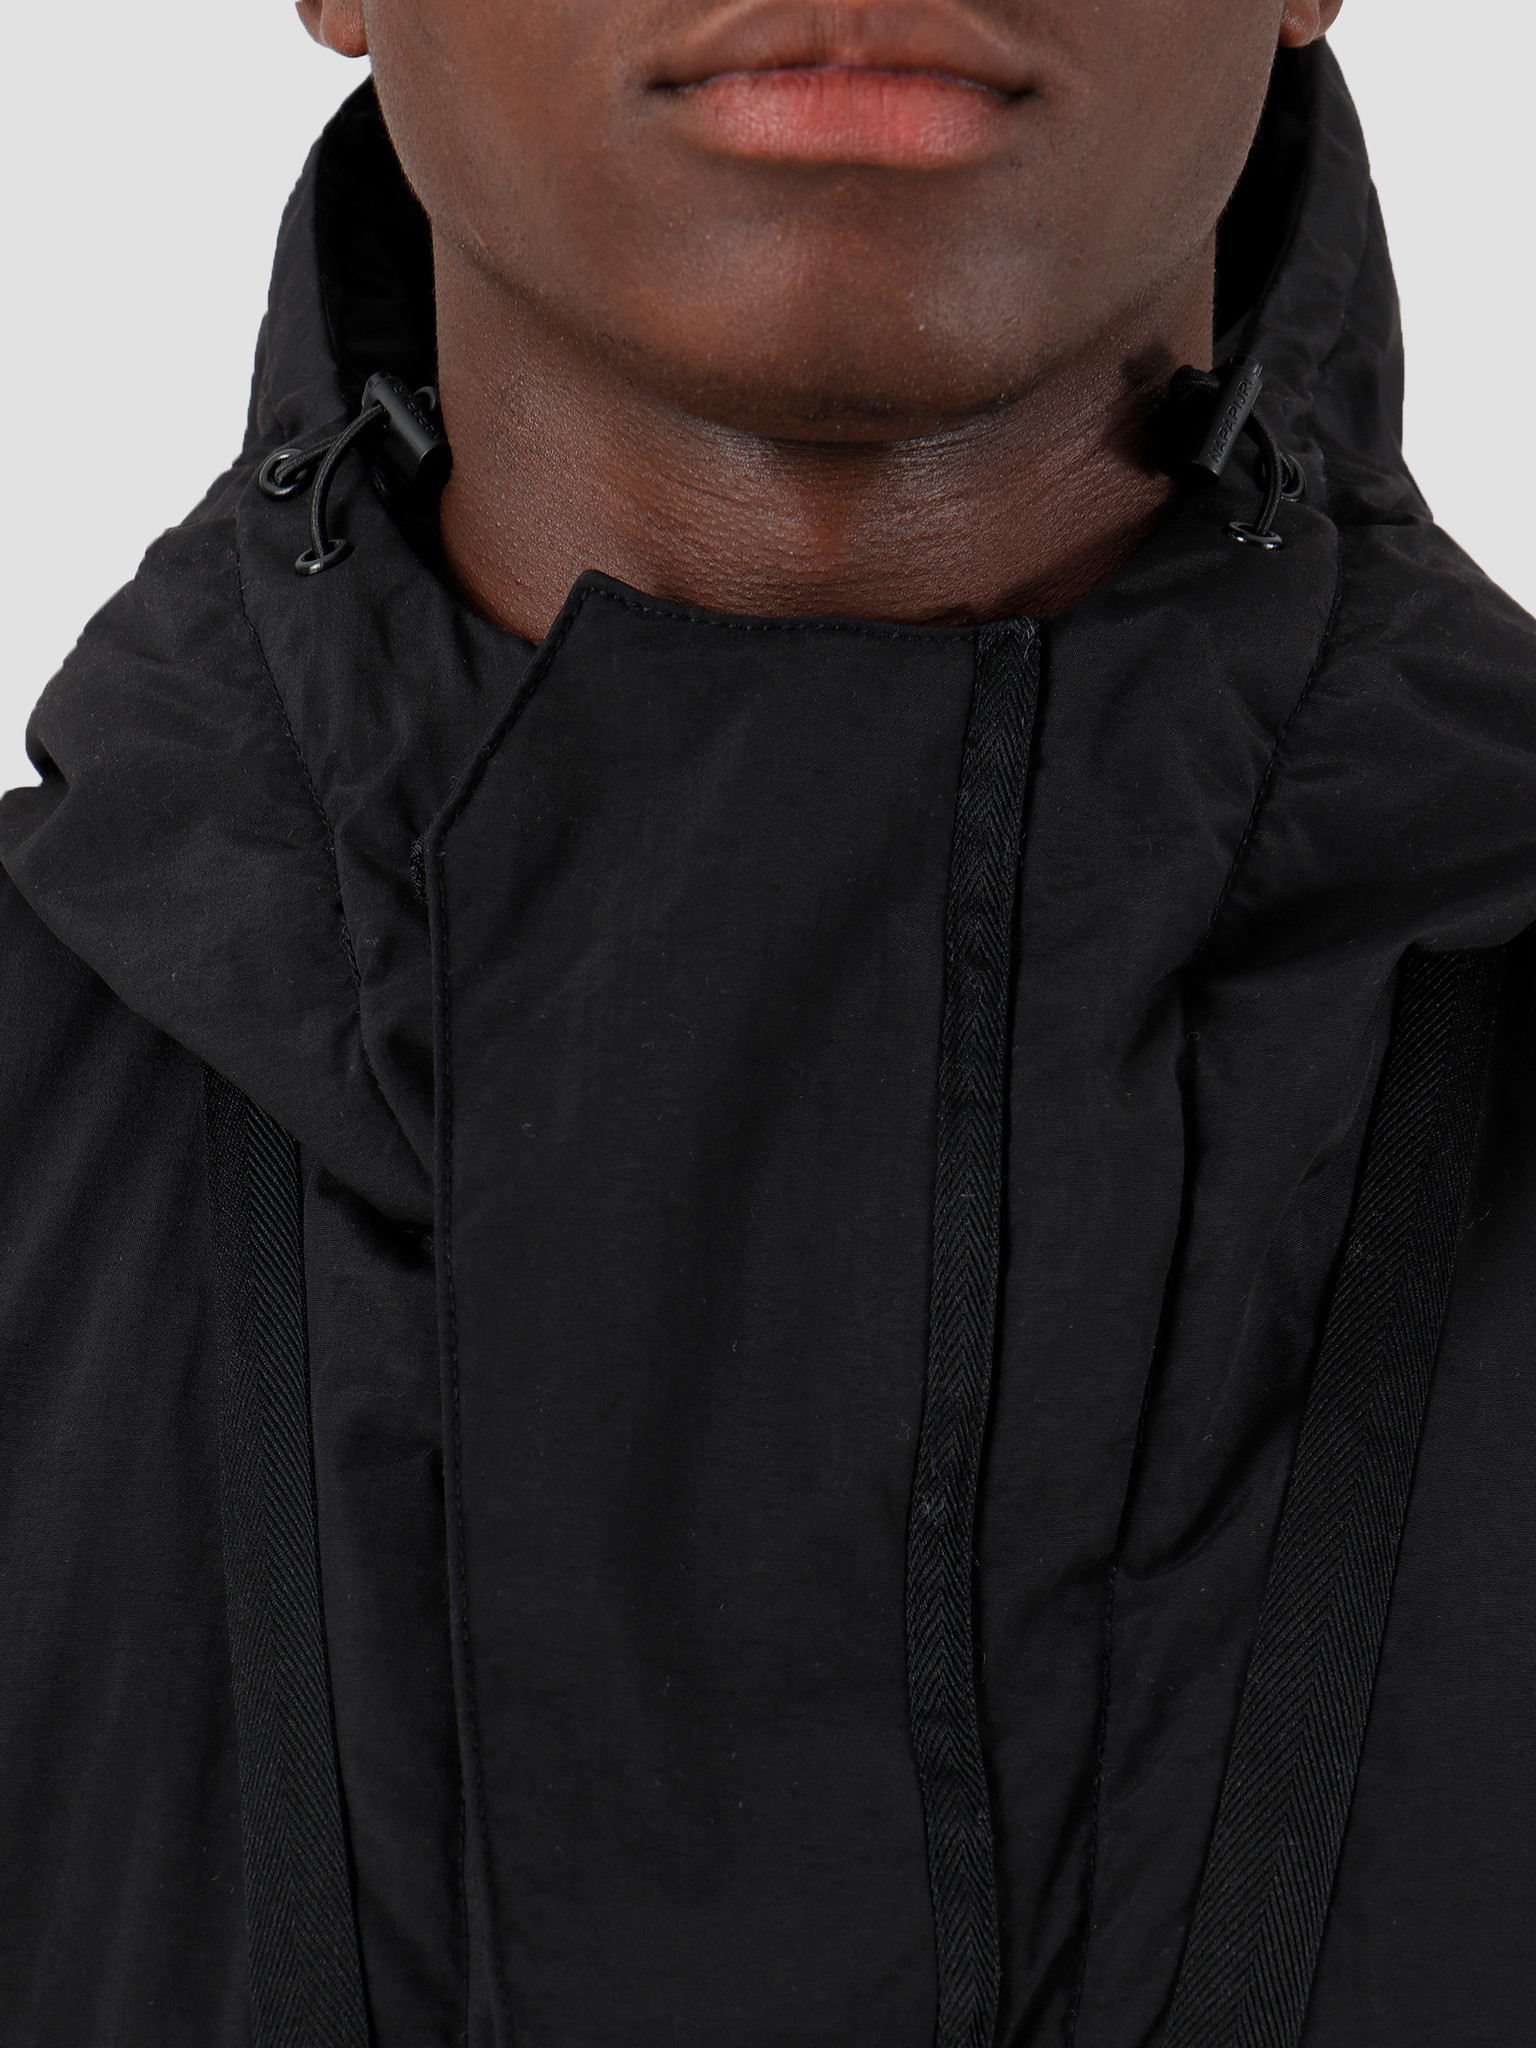 NAPAPIJRI NAPAPIJRI The Tribe Skidoo Creator Parka Black N0YIU5041